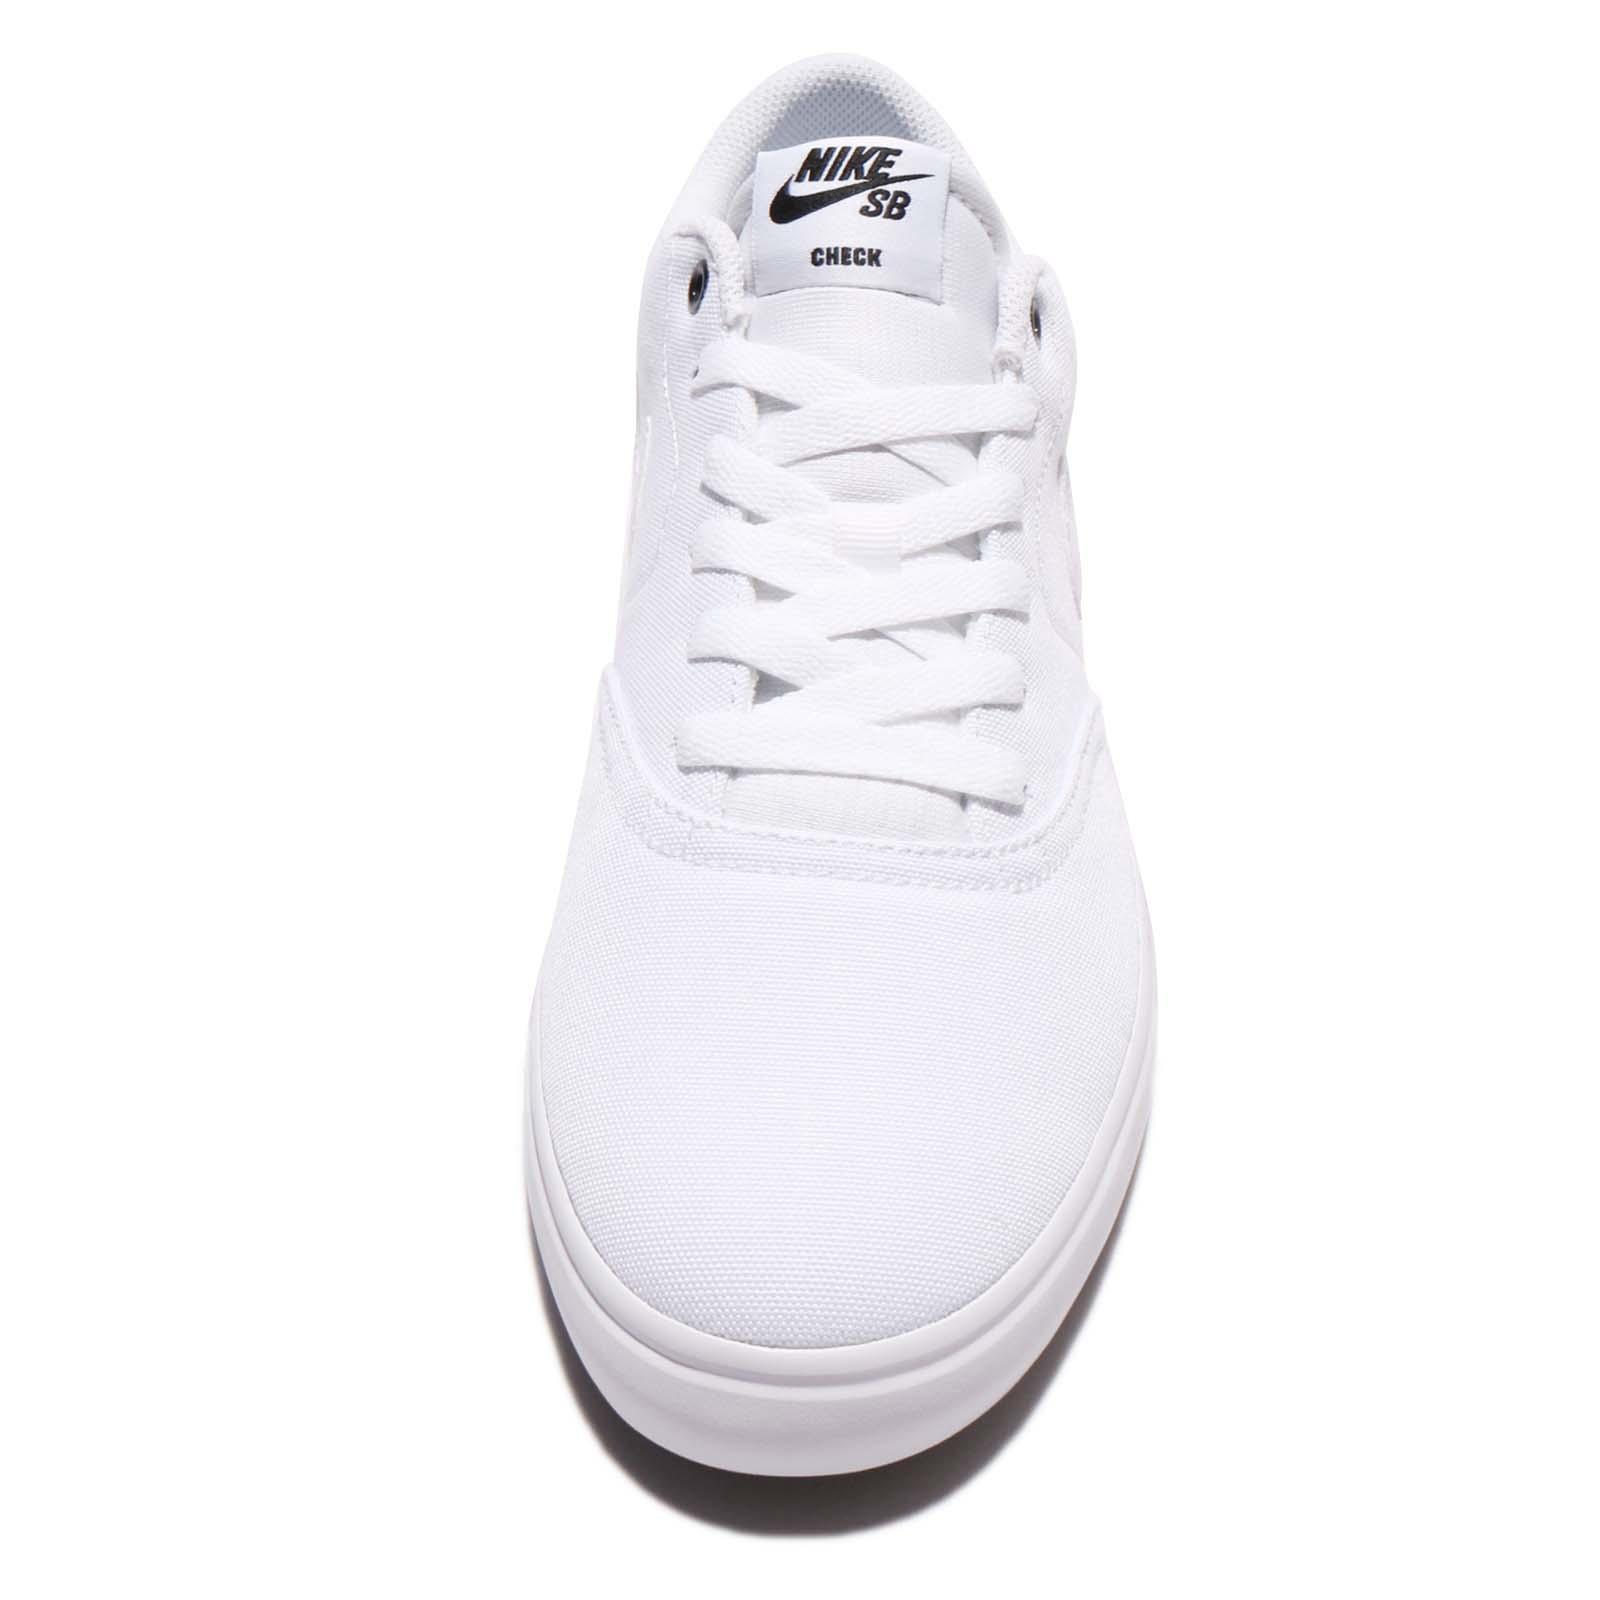 Nike Sb Check Solar Cnvs Canvas White Men Skate Boarding